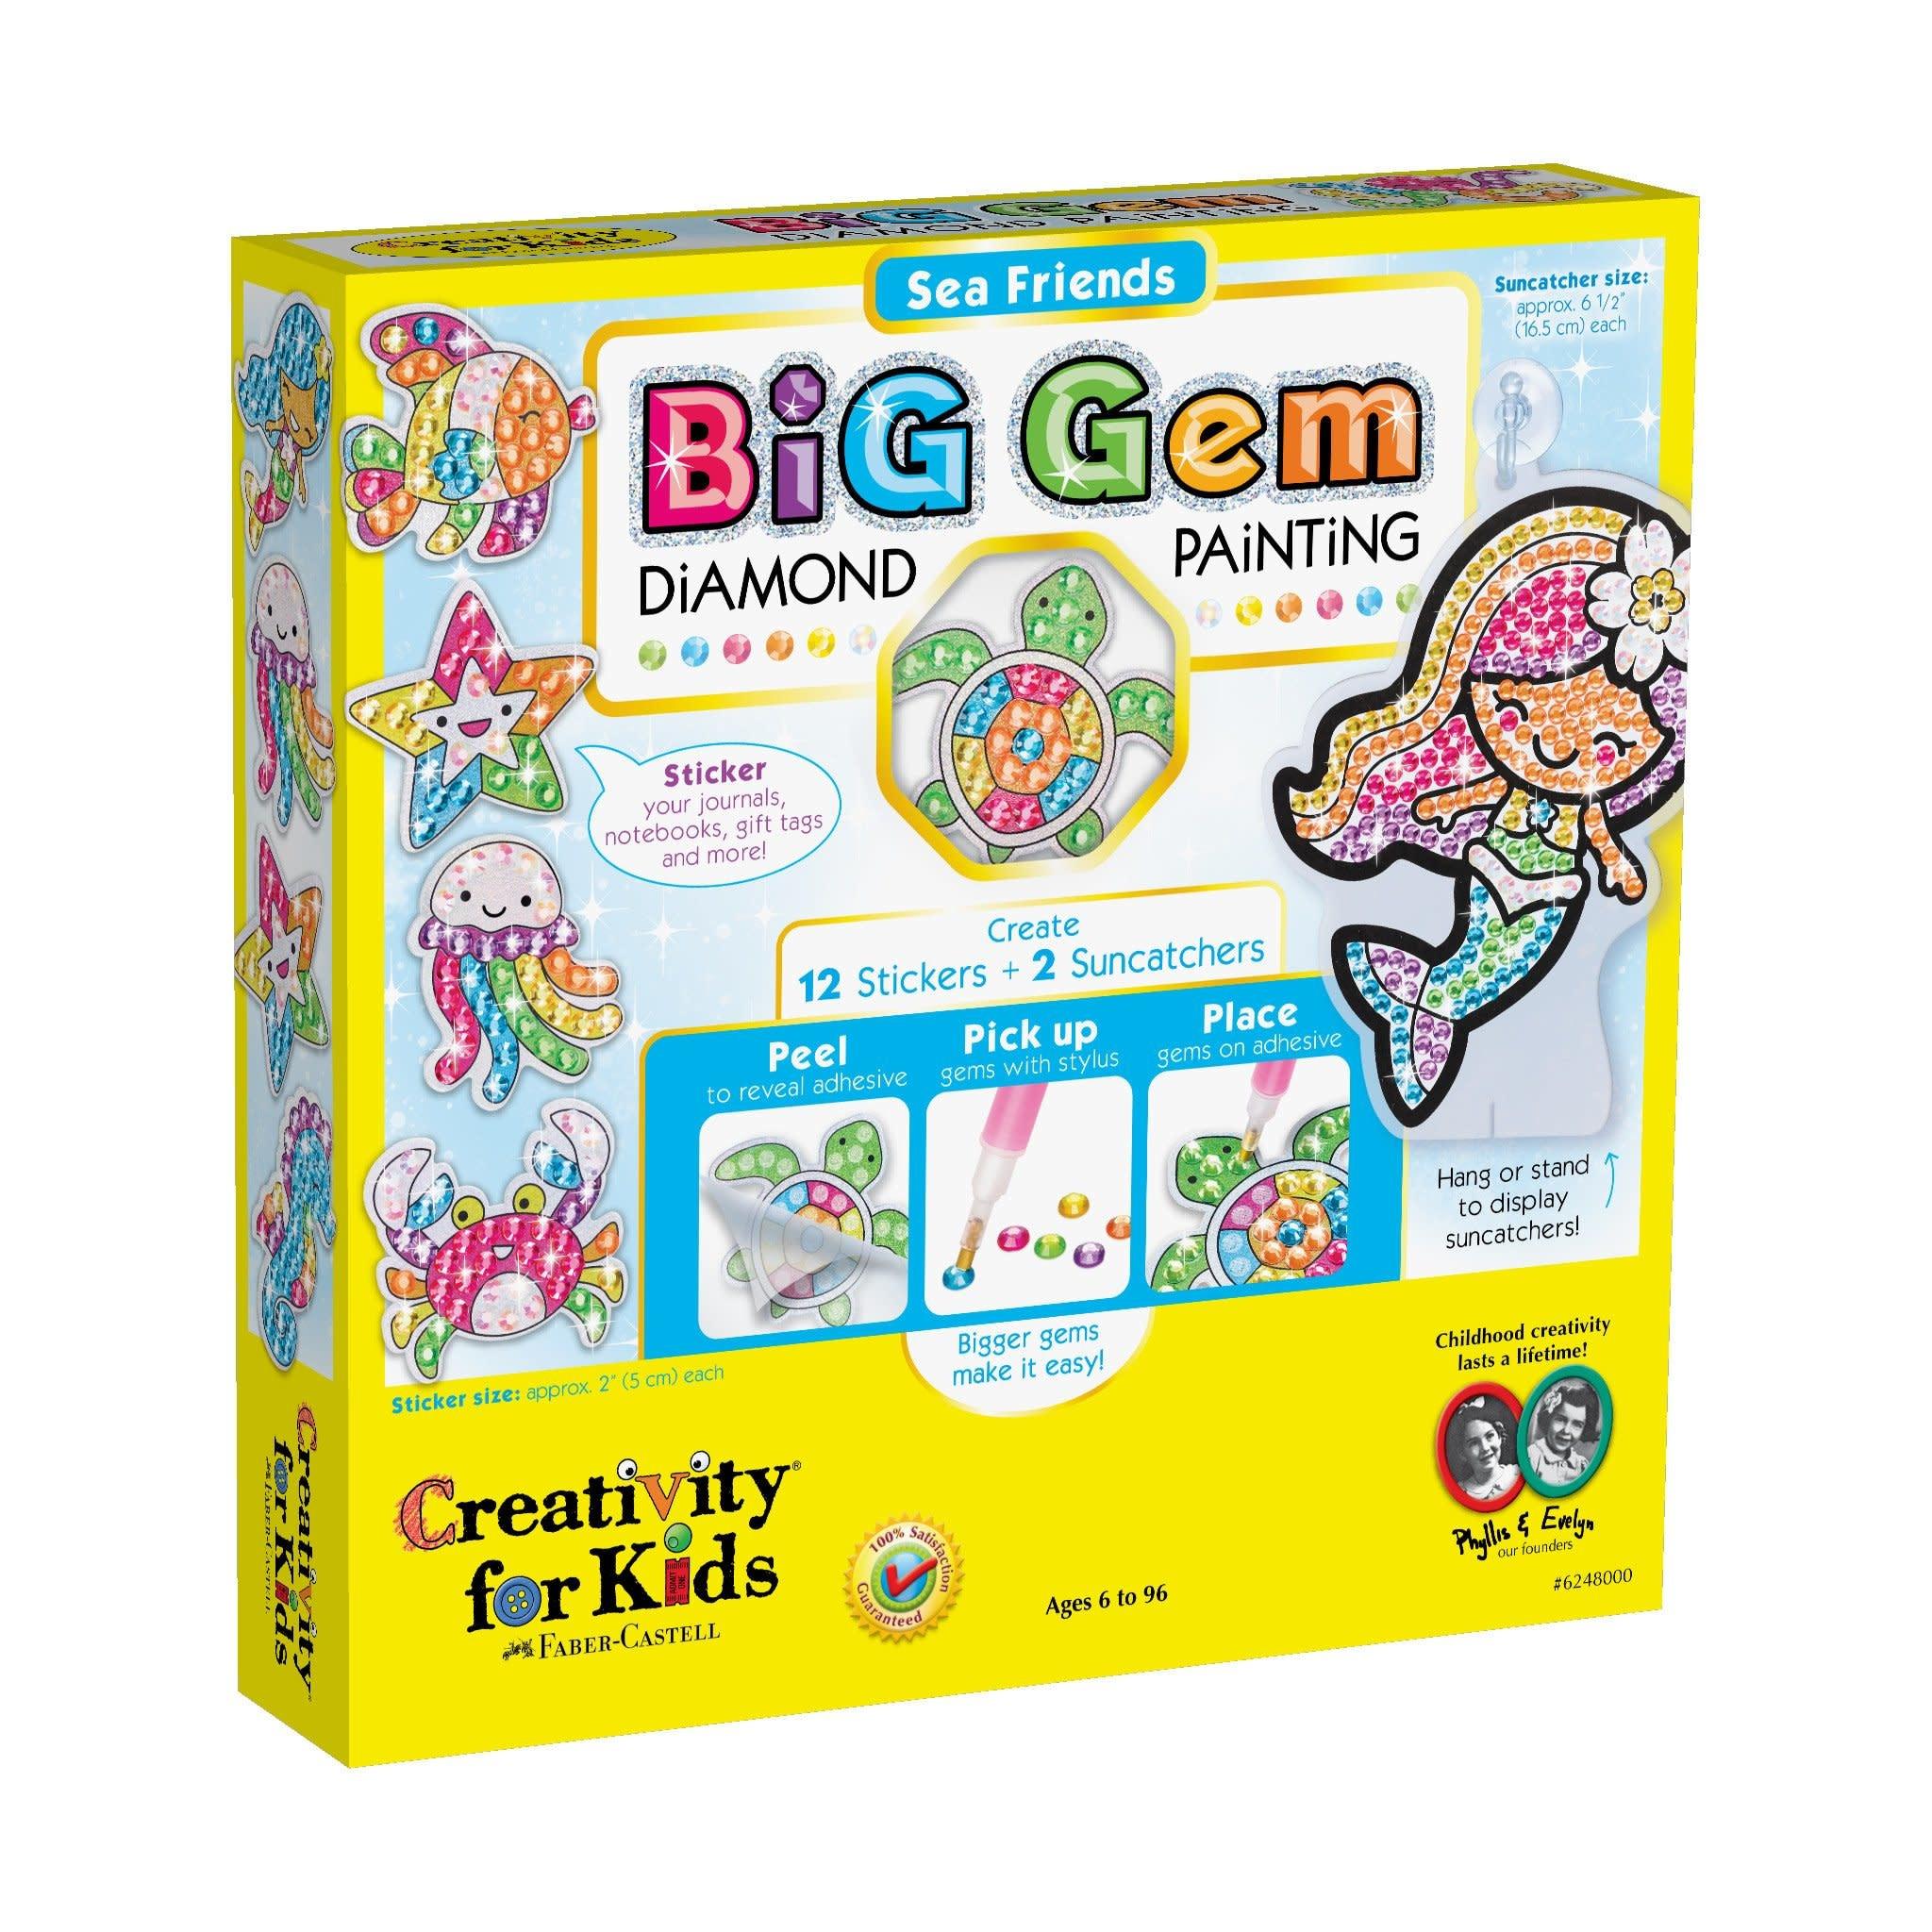 Big Gems Sea Friends Diamond Painting Kit-2